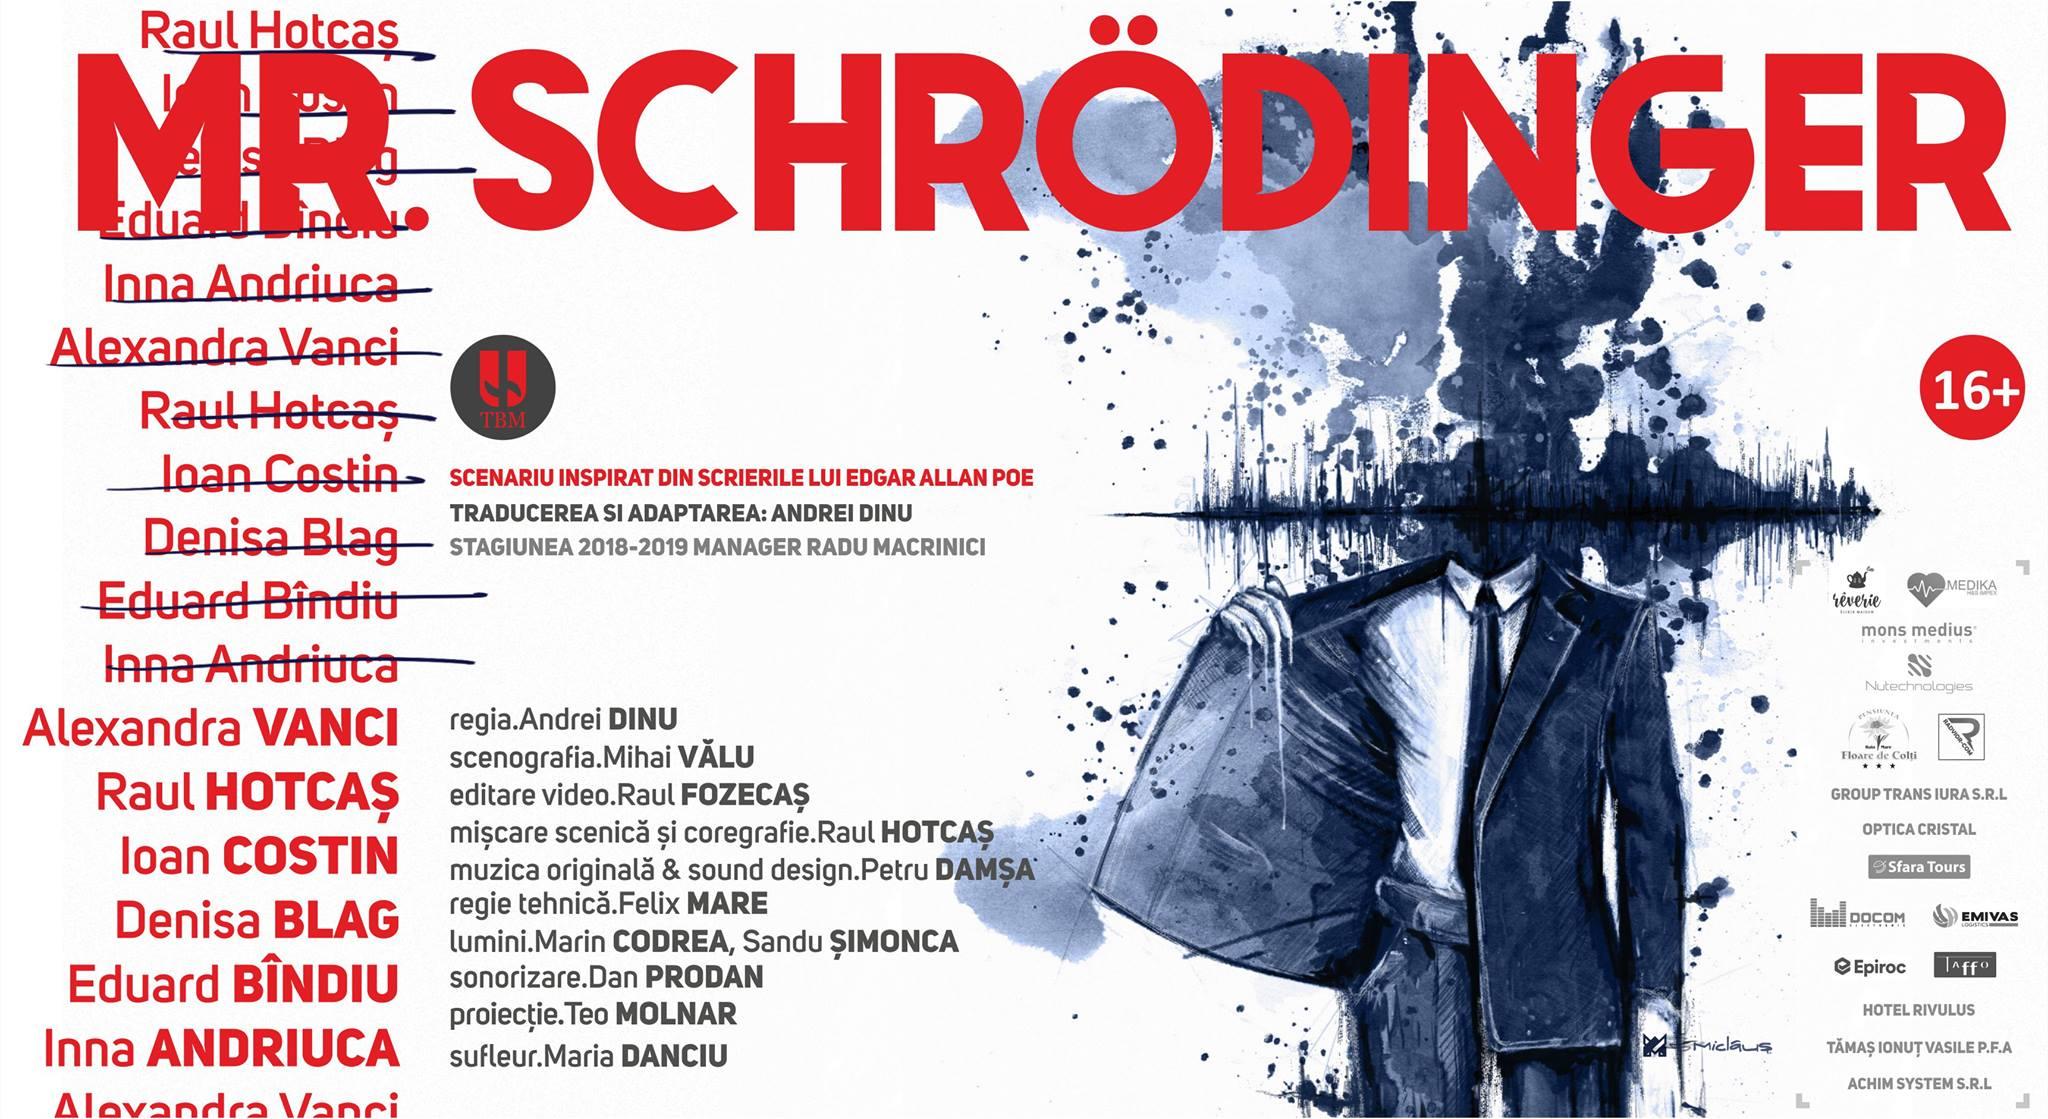 Mr. Schrödinger